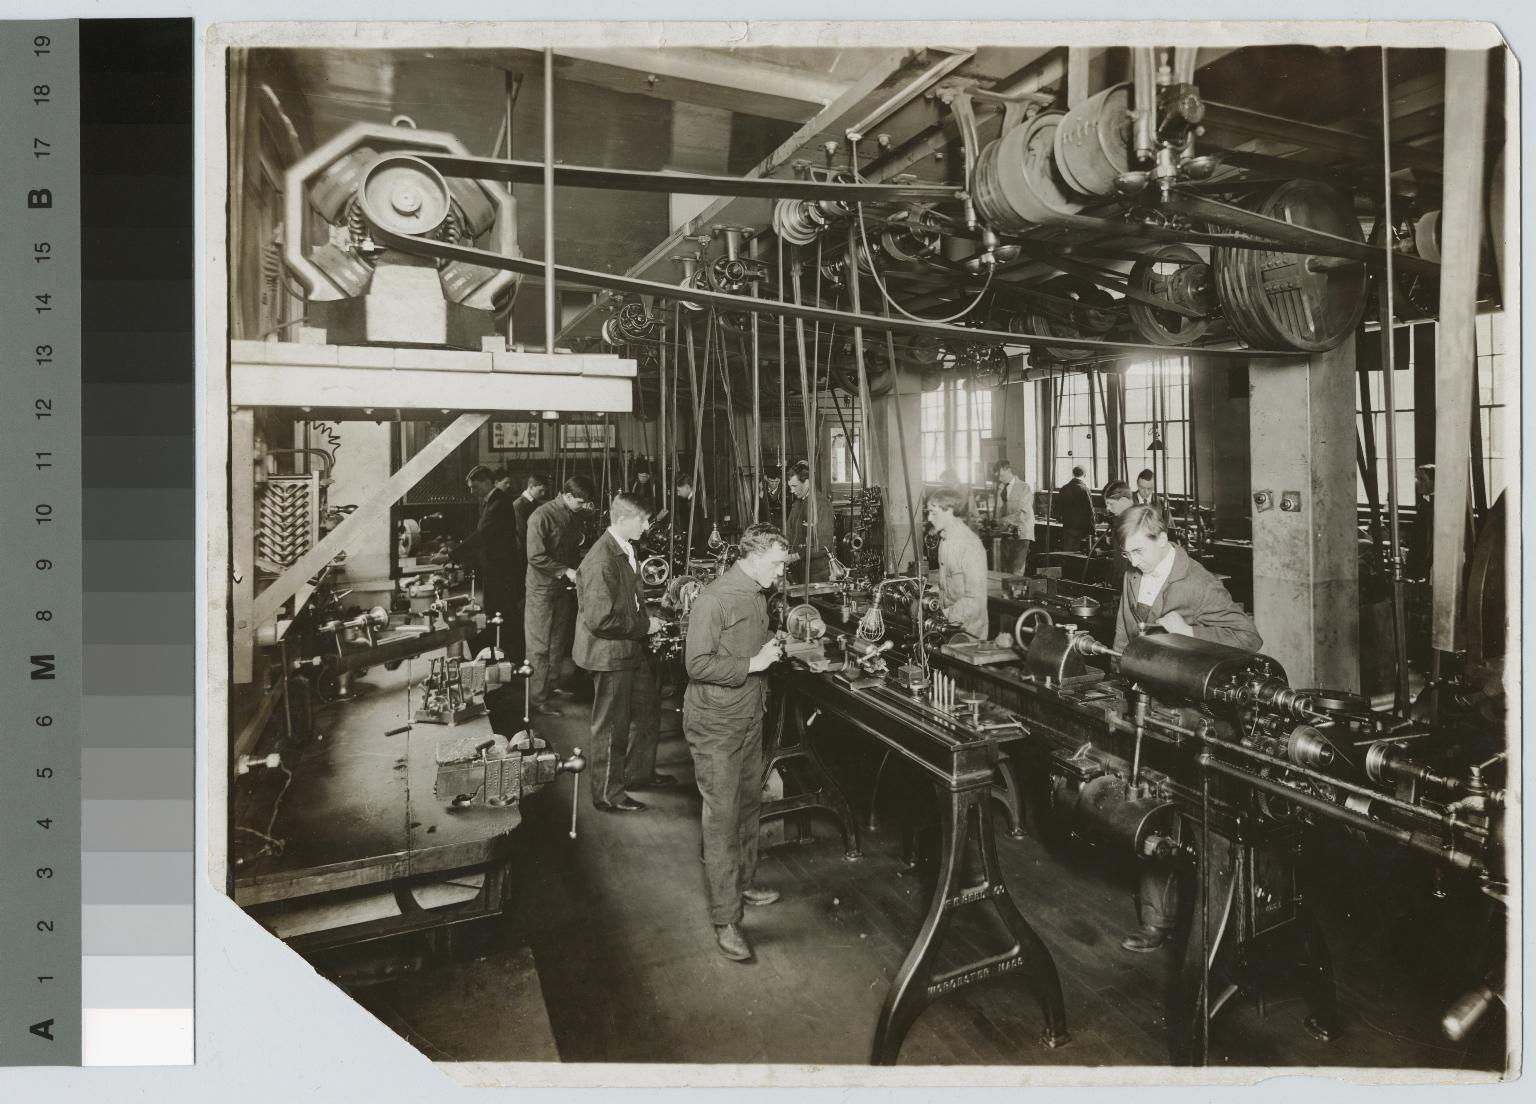 Students operate machinery, machine shop, School of Industrial Arts, Rochester Athenaeum and Mechanics Institute [circa 1907]